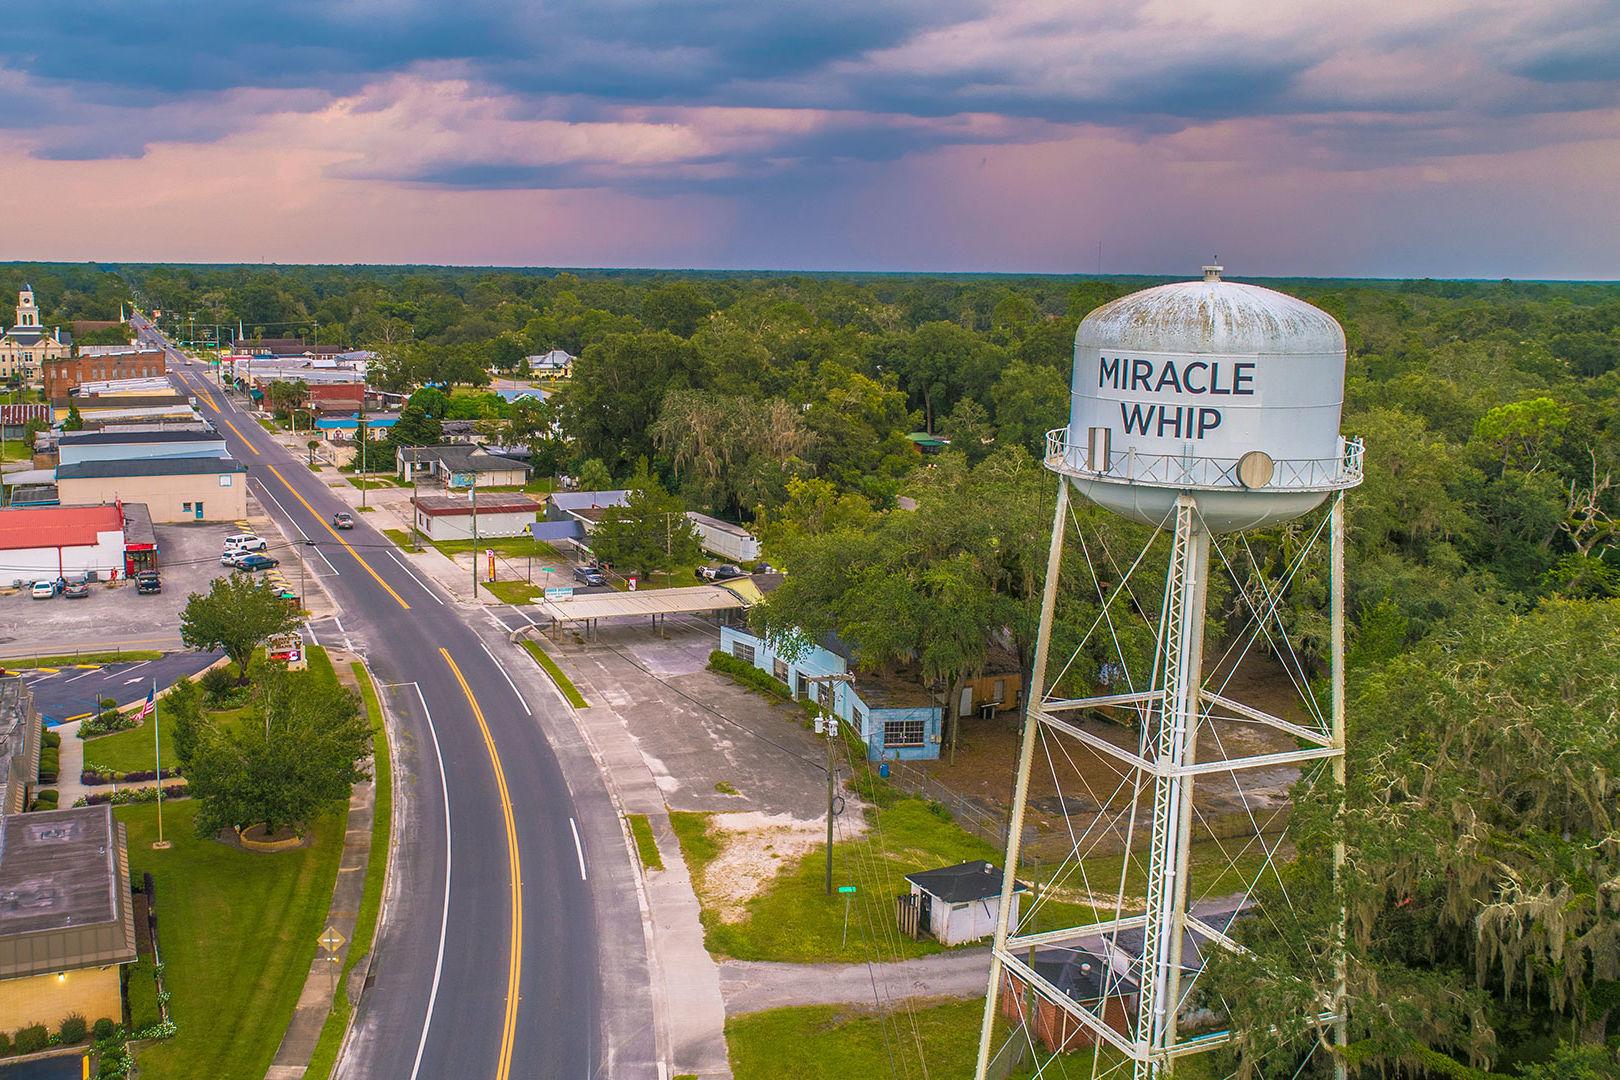 Mayo Florida Miracle Whip Water Tower